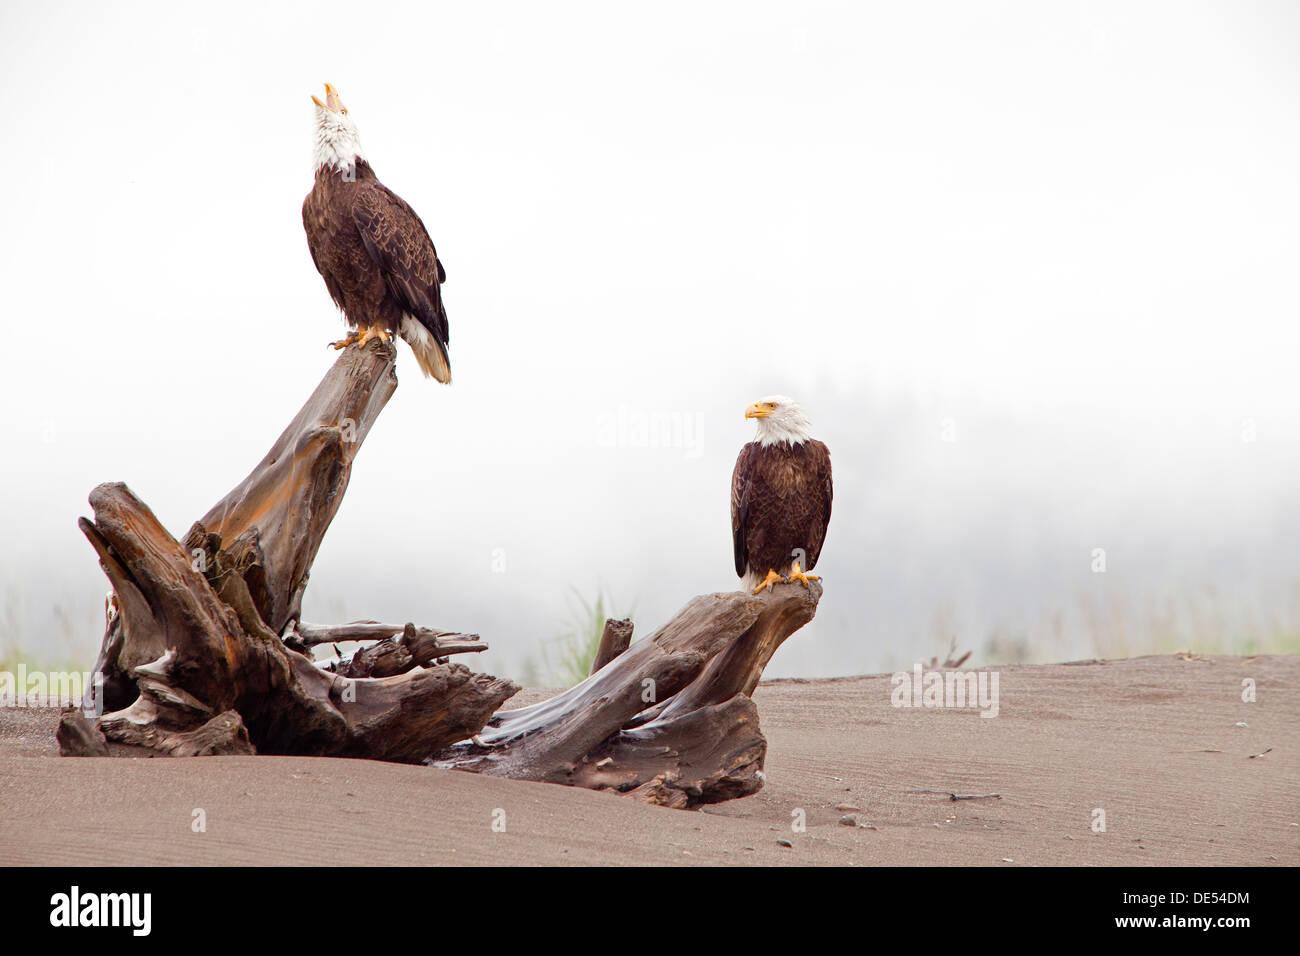 Bald eagle,- Haliaeetus leucocephalus -, Lake Clark National Park, Alaska, U.S.A. - Stock Image